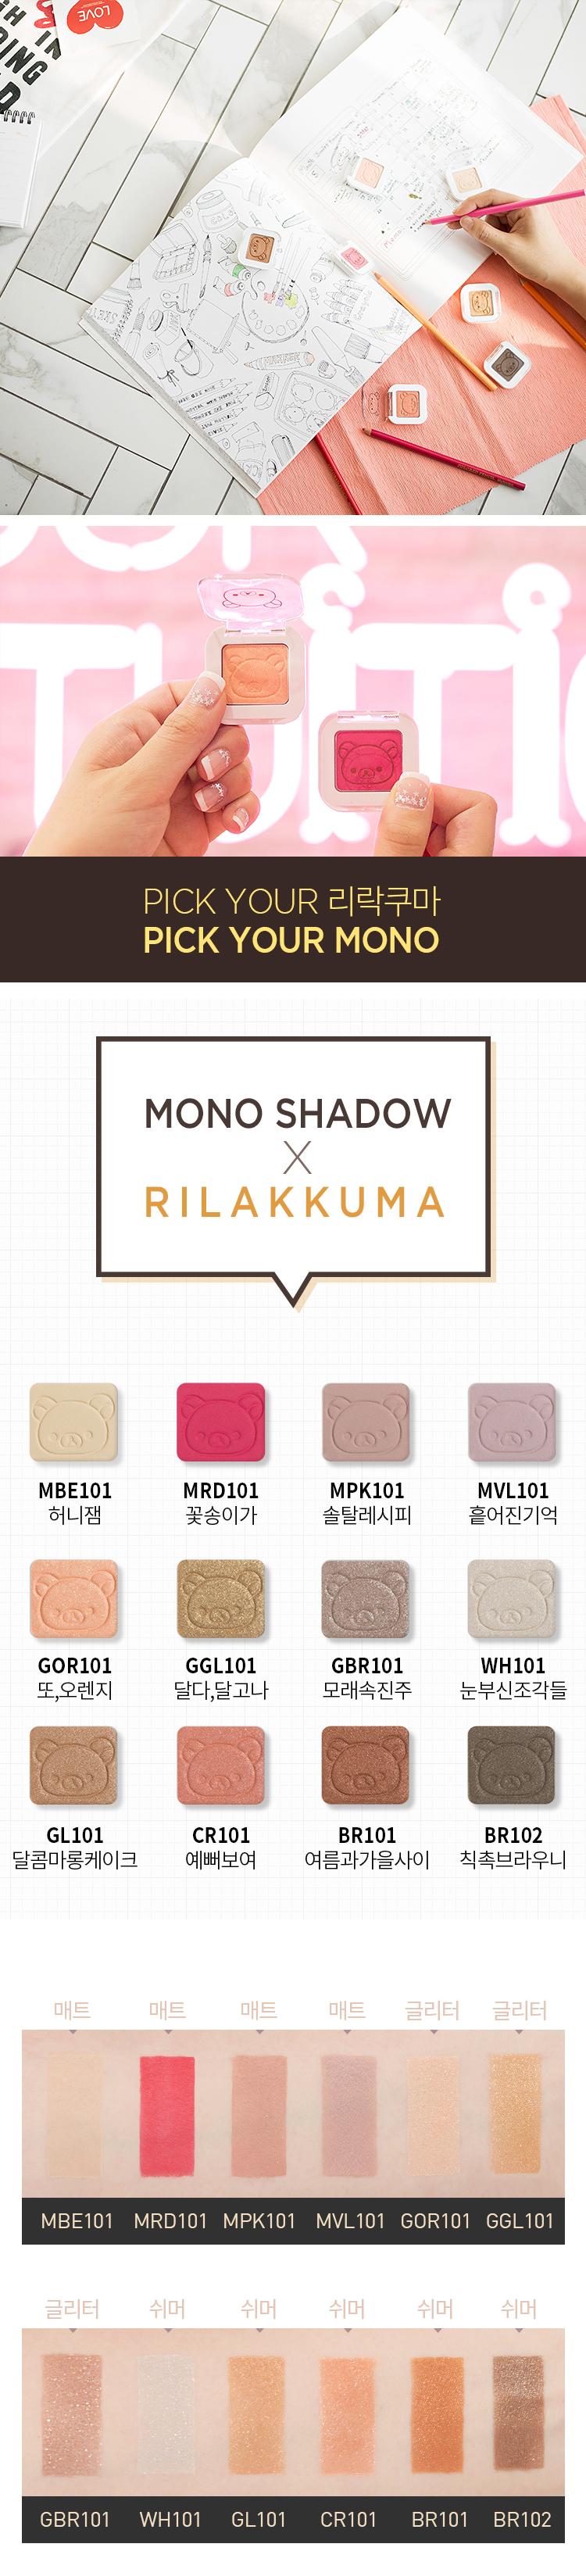 a-pieu-rilakkuma-mineral-mono-shadow-1.9g-1.jpg